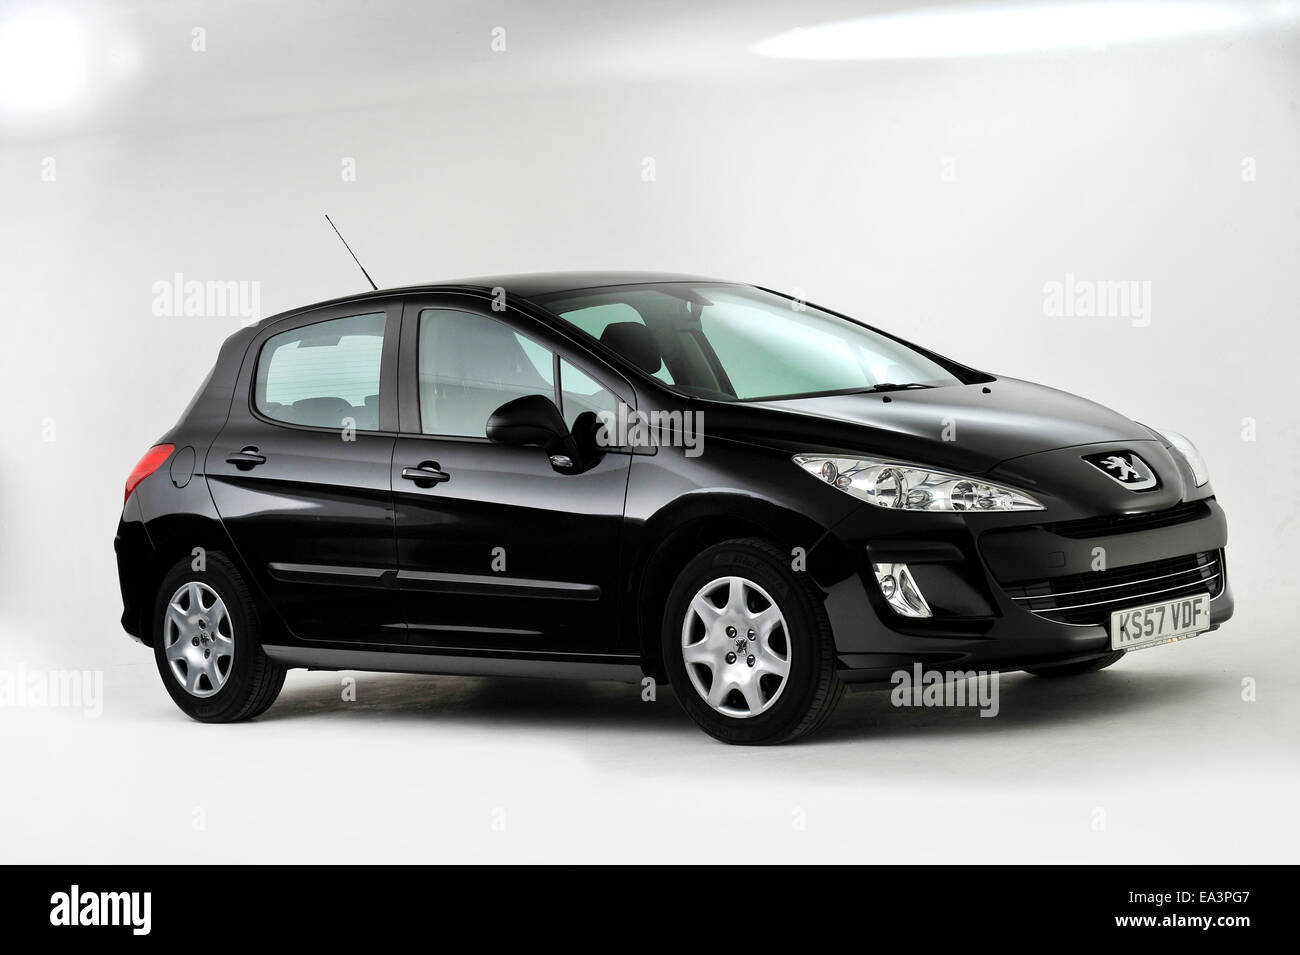 2007 Peugeot 308 - Stock Image